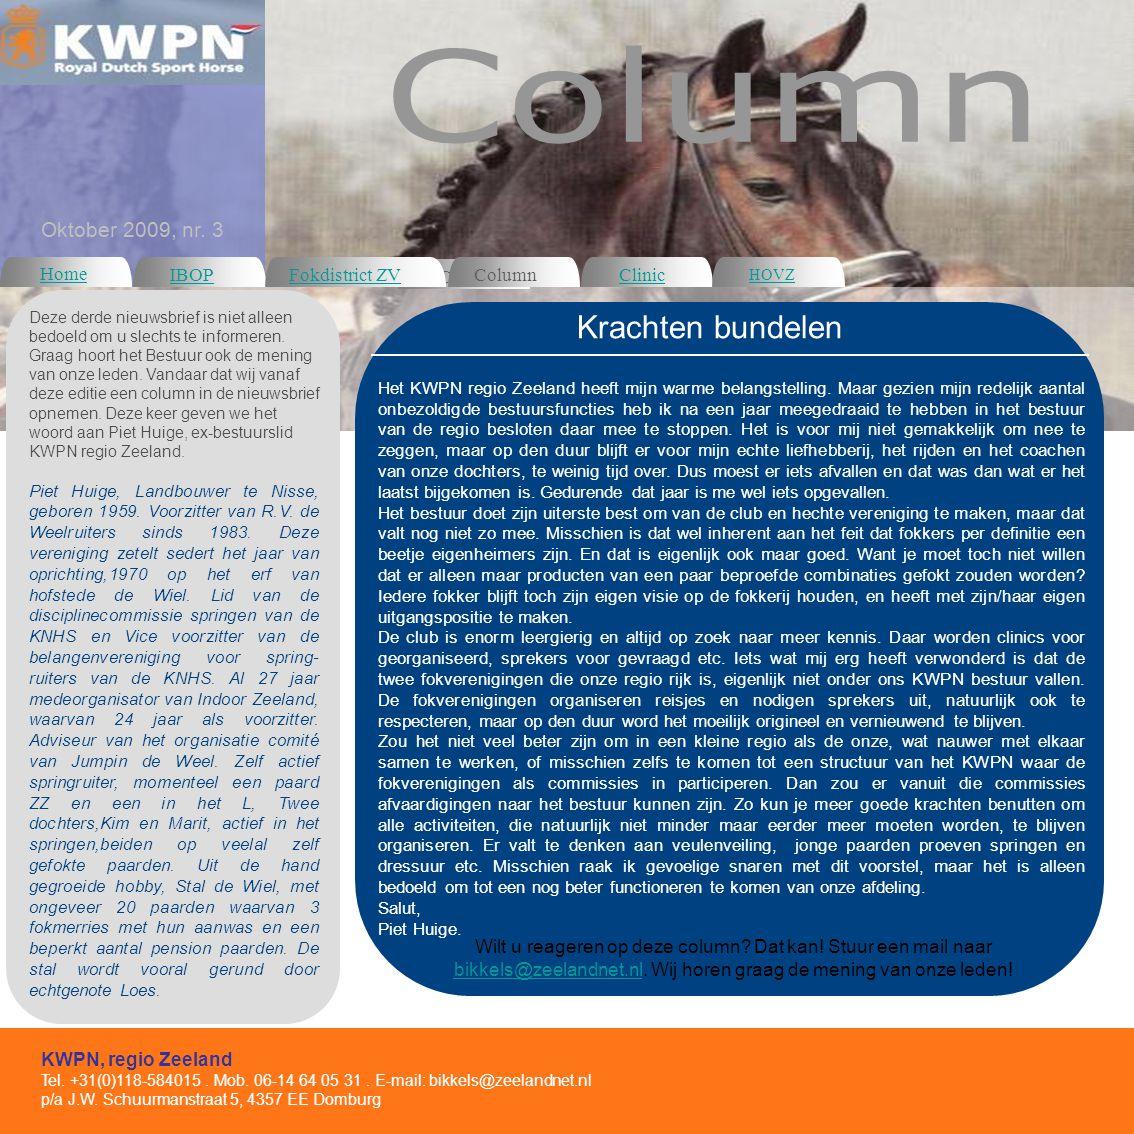 Home IBOP Column Clinic KWPN, regio Zeeland Tel. +31(0)118-584015.